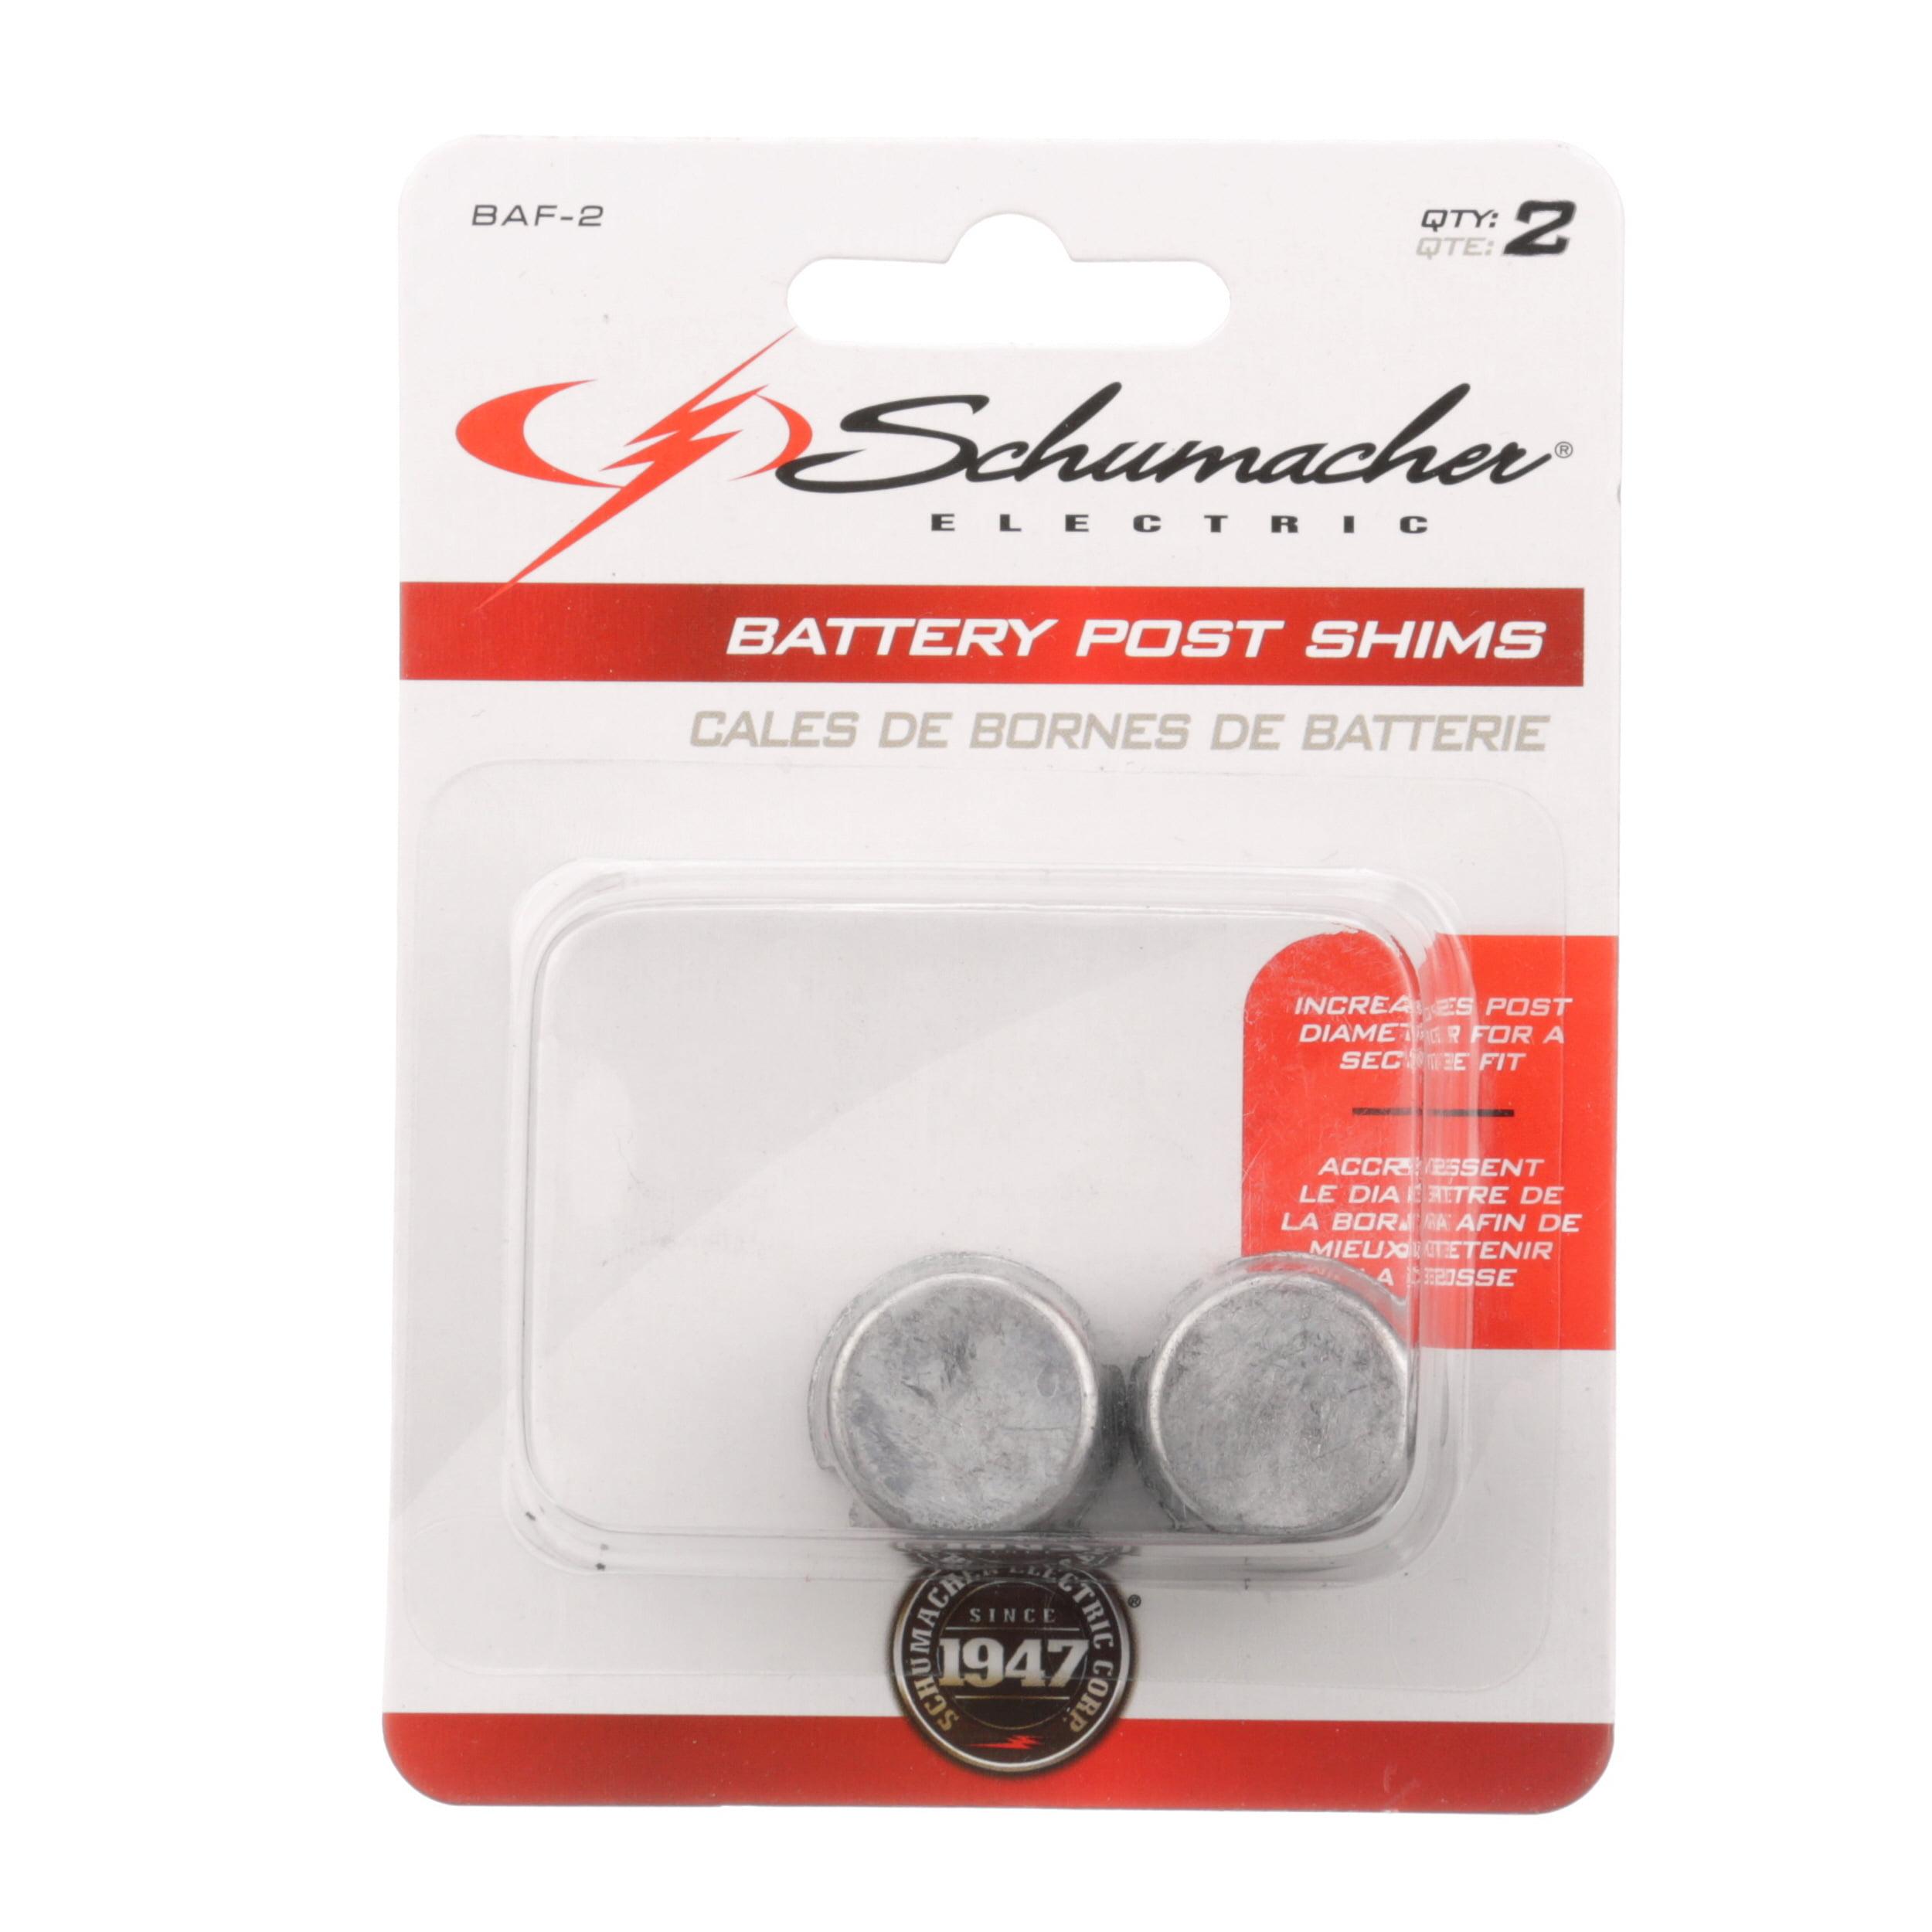 Schumacher Electric Battery Post Shim